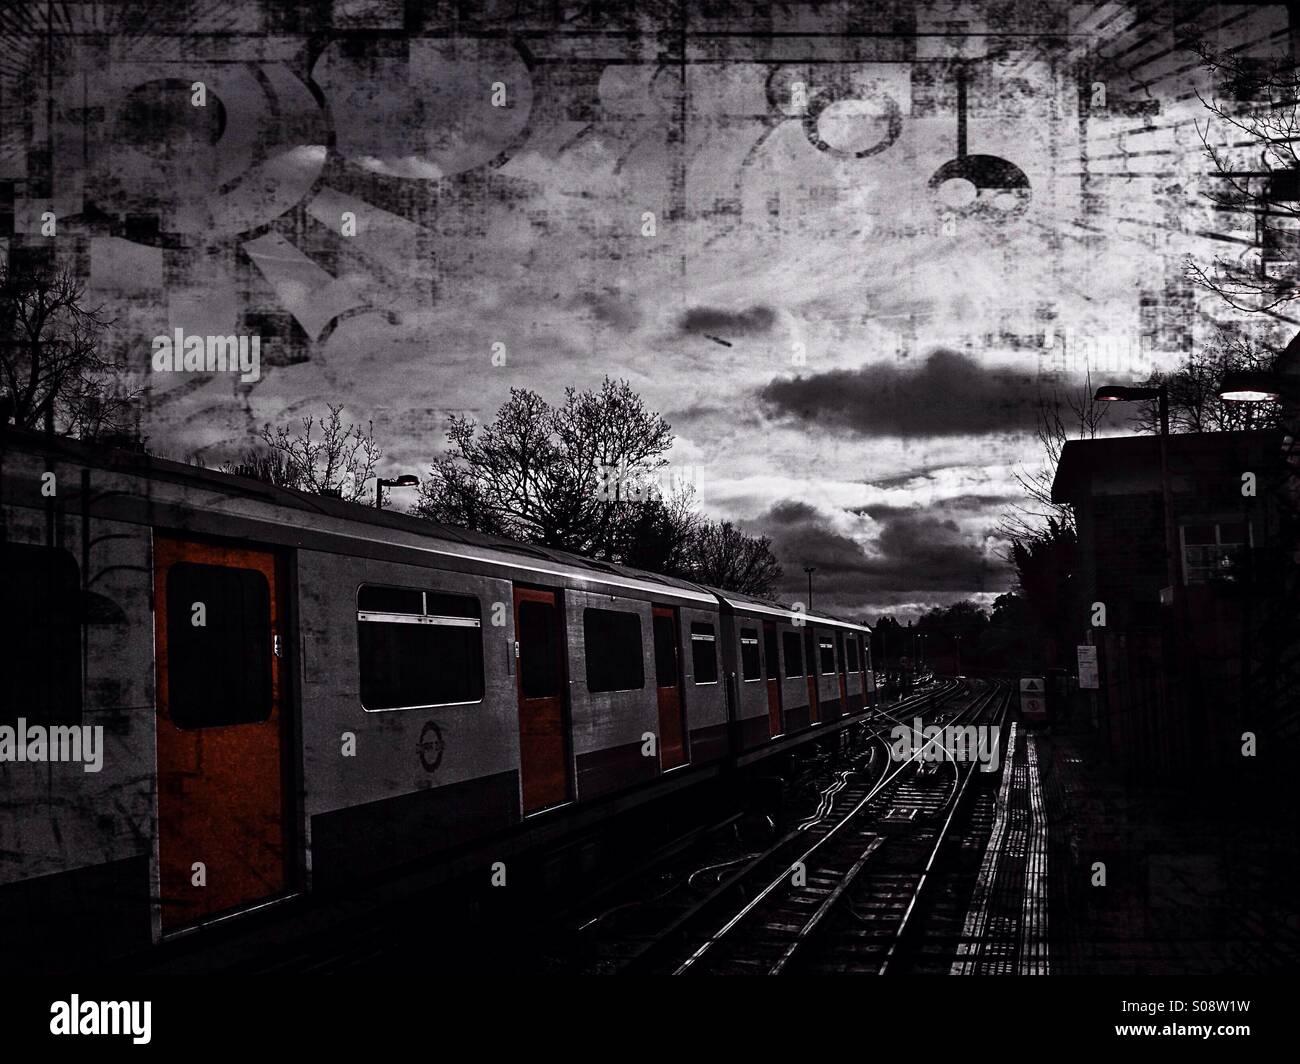 Tube train and tracks, London, UK Stock Photo